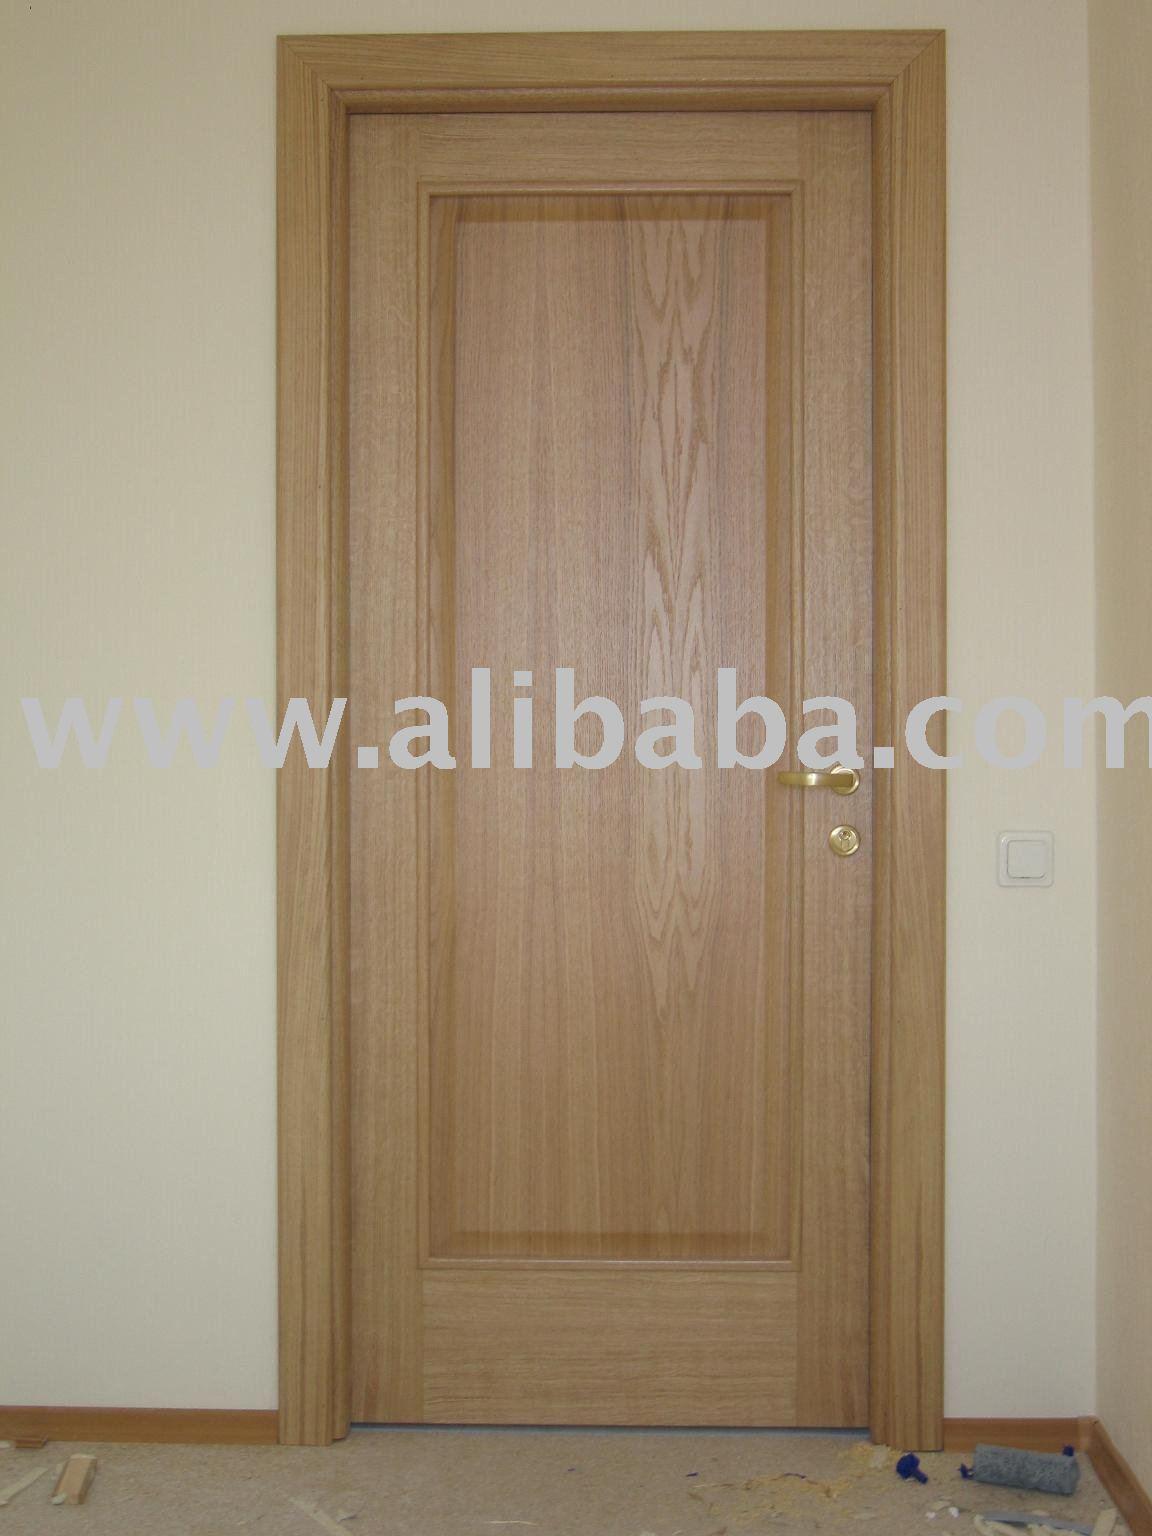 santiago aberturas abertura o puertas de madera caroldoey On puertas de madera santiago